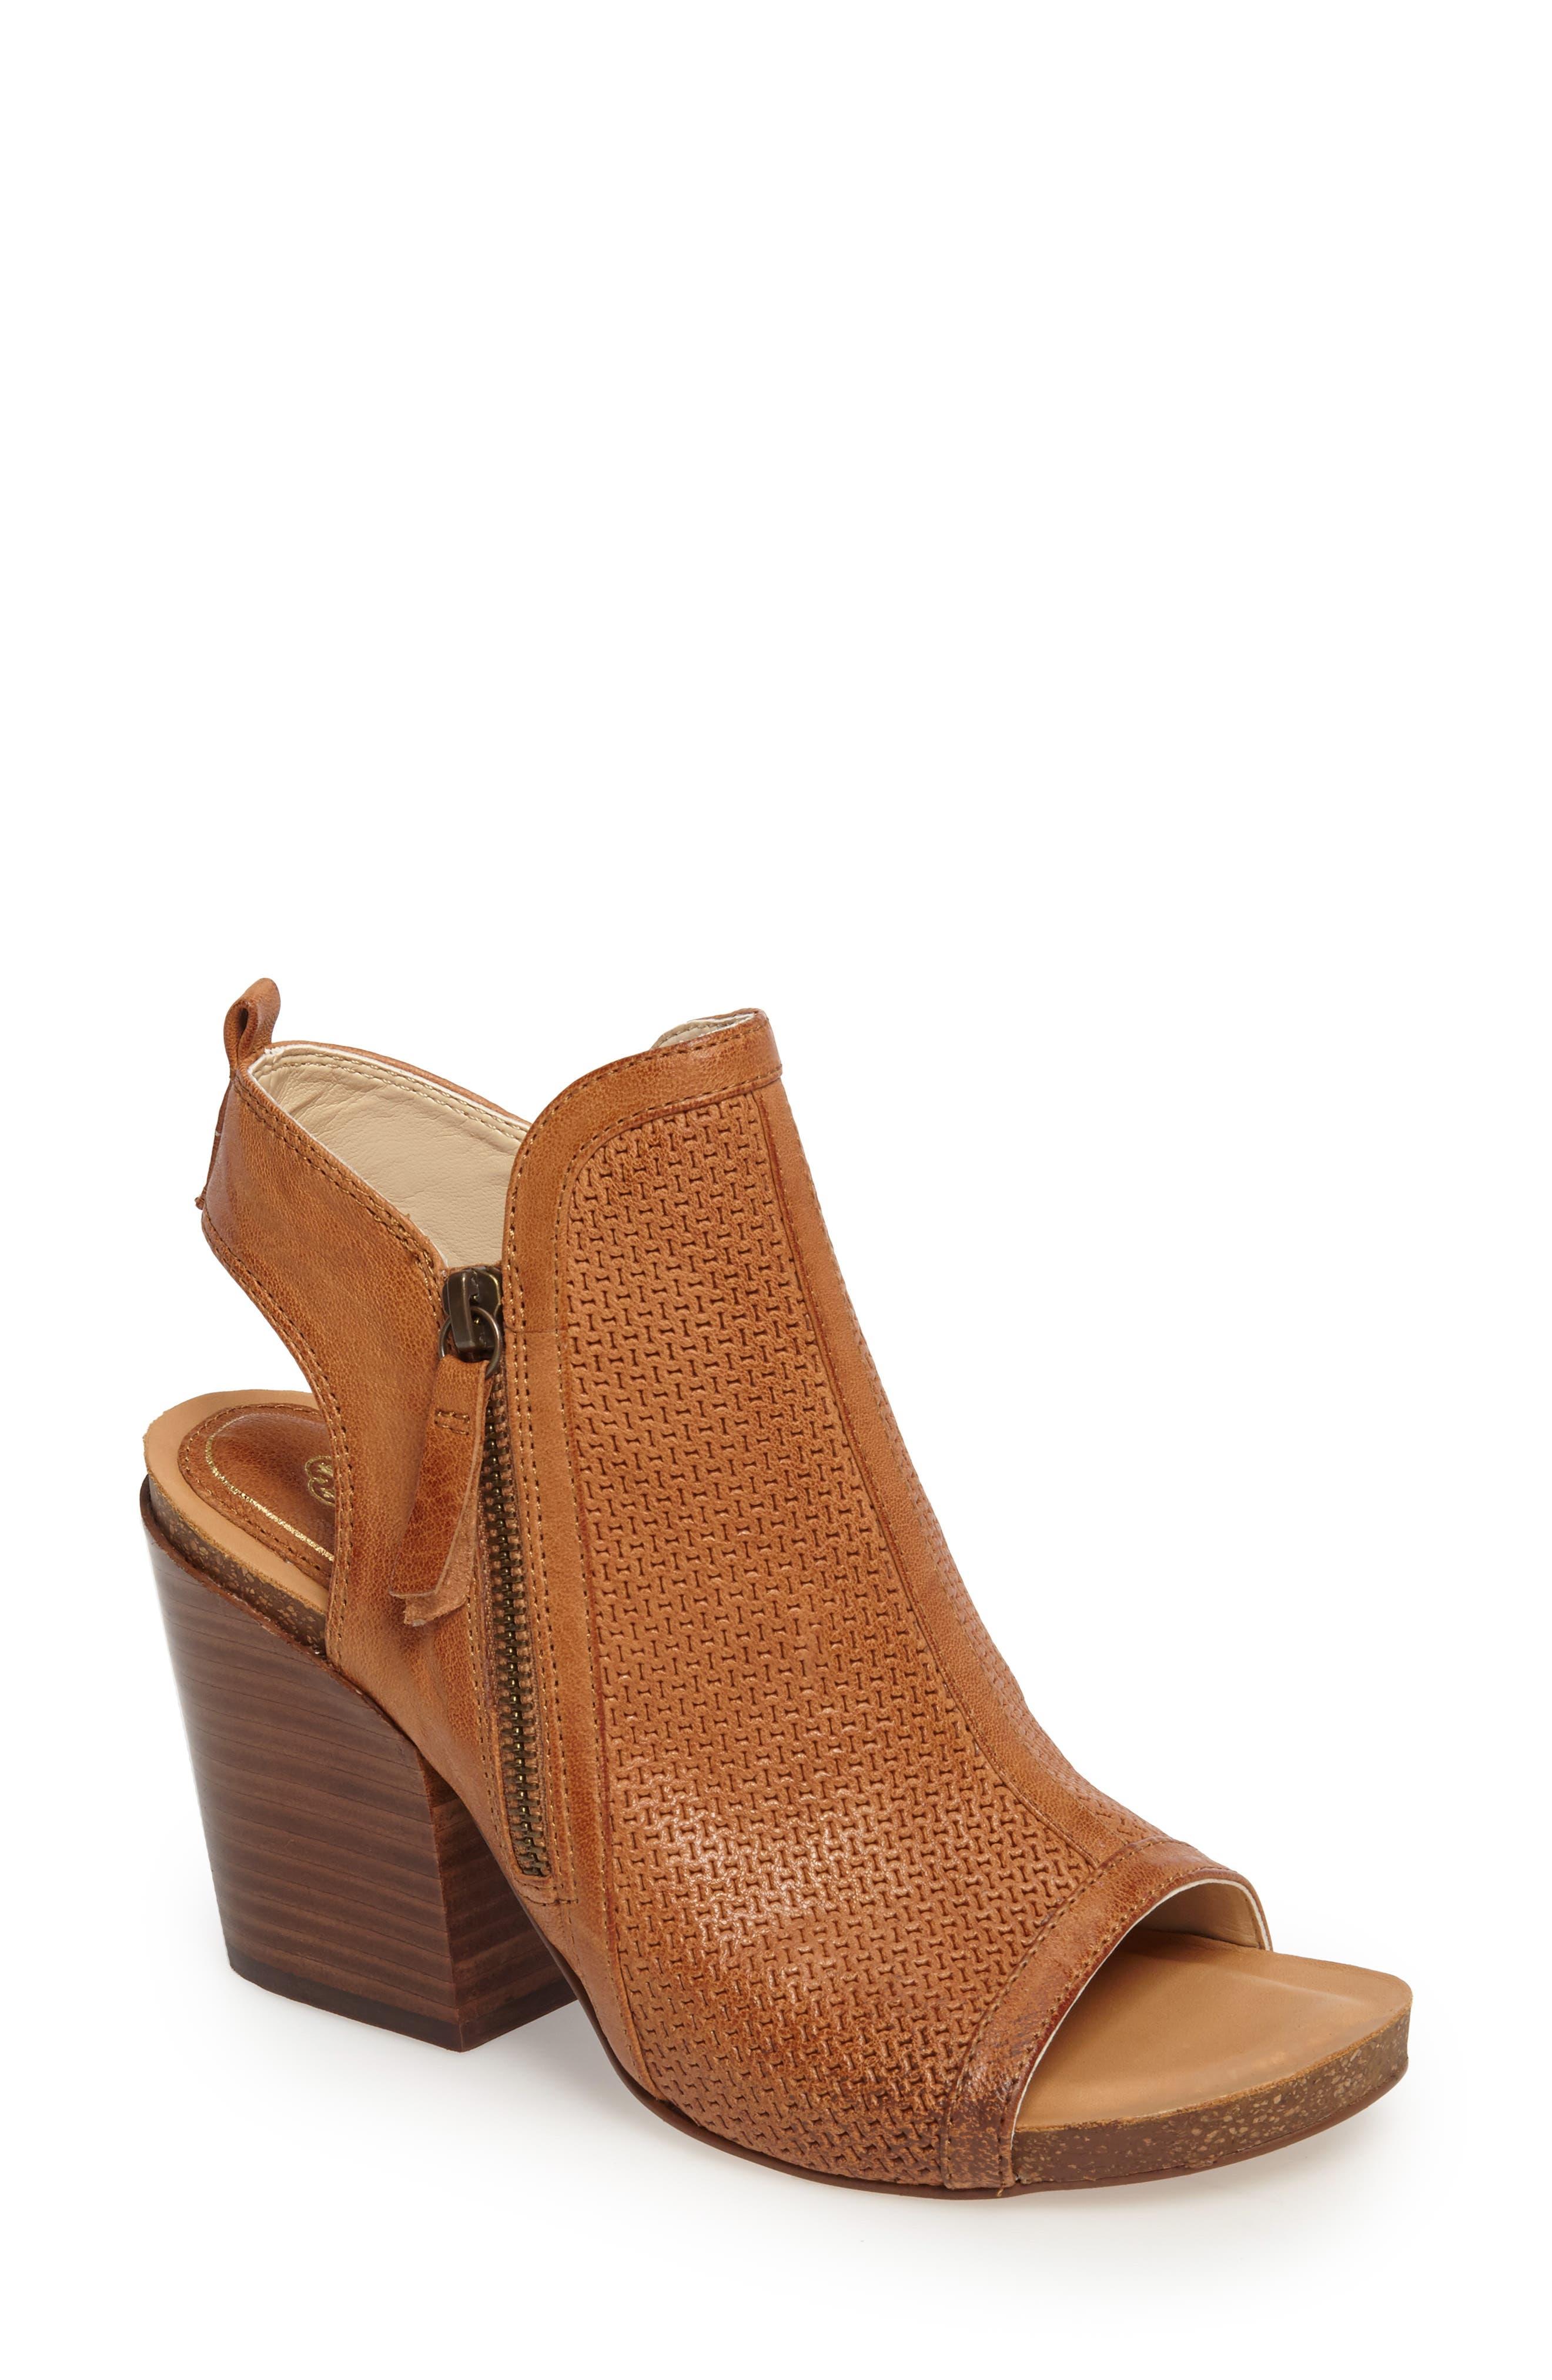 Iliana Open Toe Bootie,                         Main,                         color, Luggage Leather